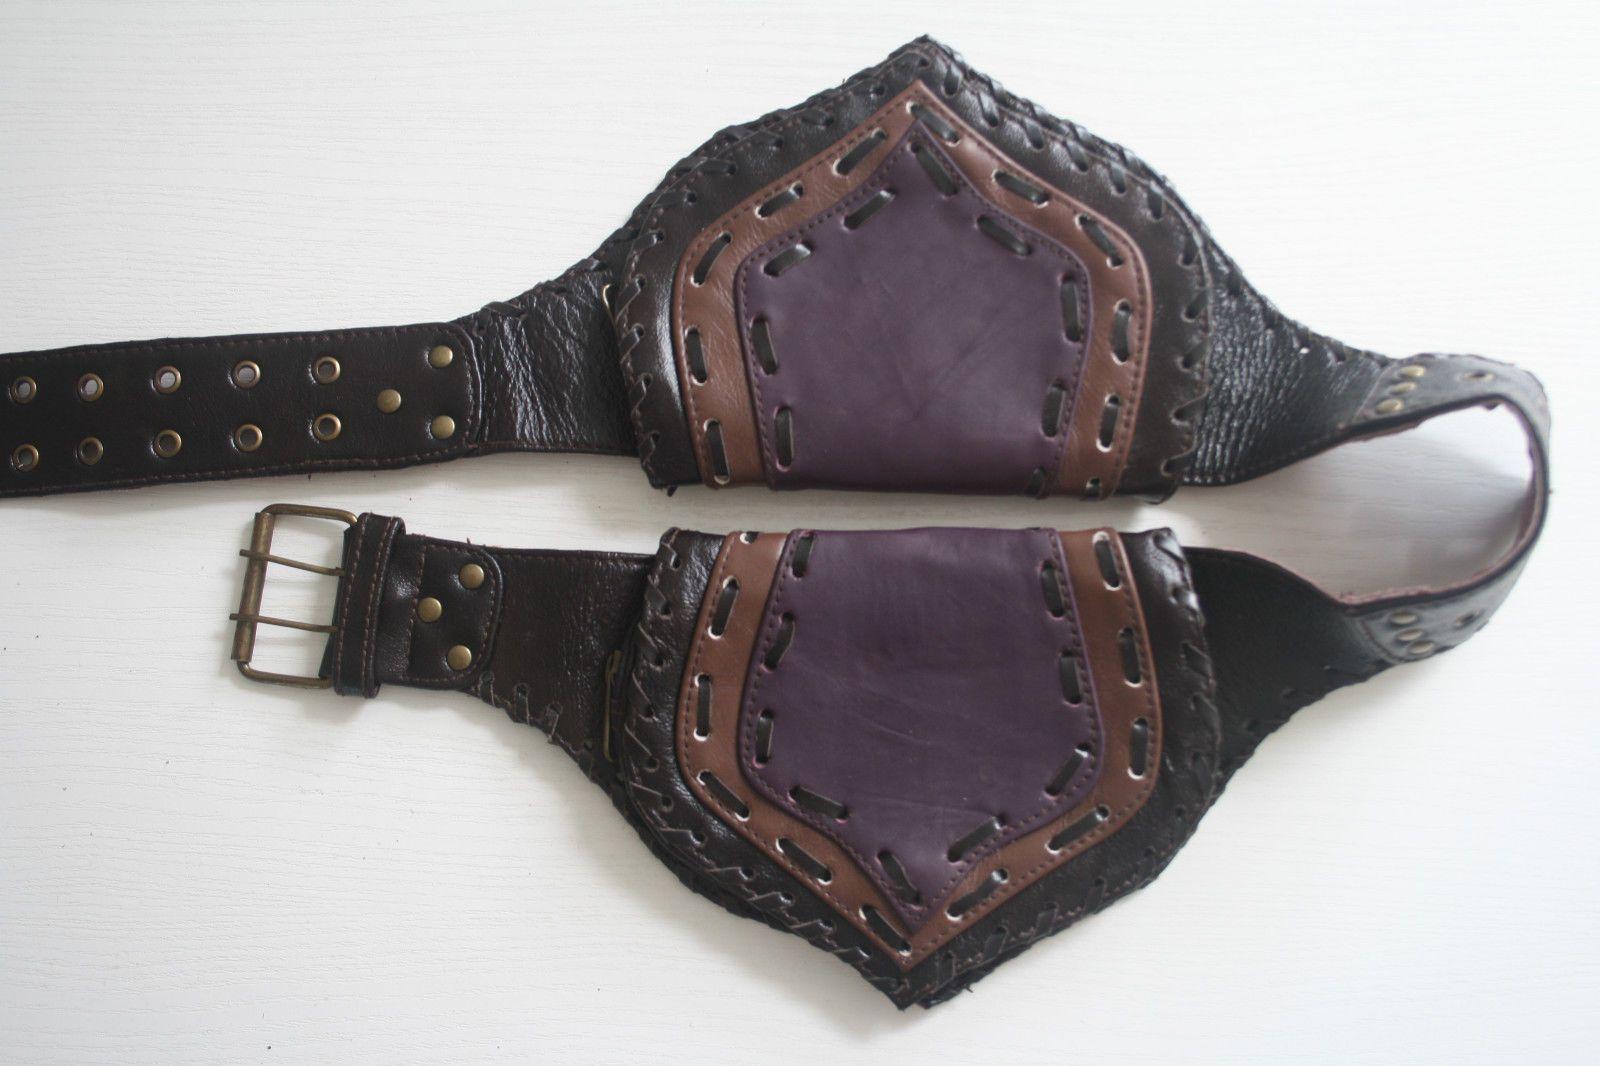 Leder Gürteltasche Bauchtasche Festivalbag Goa Hüfttasche